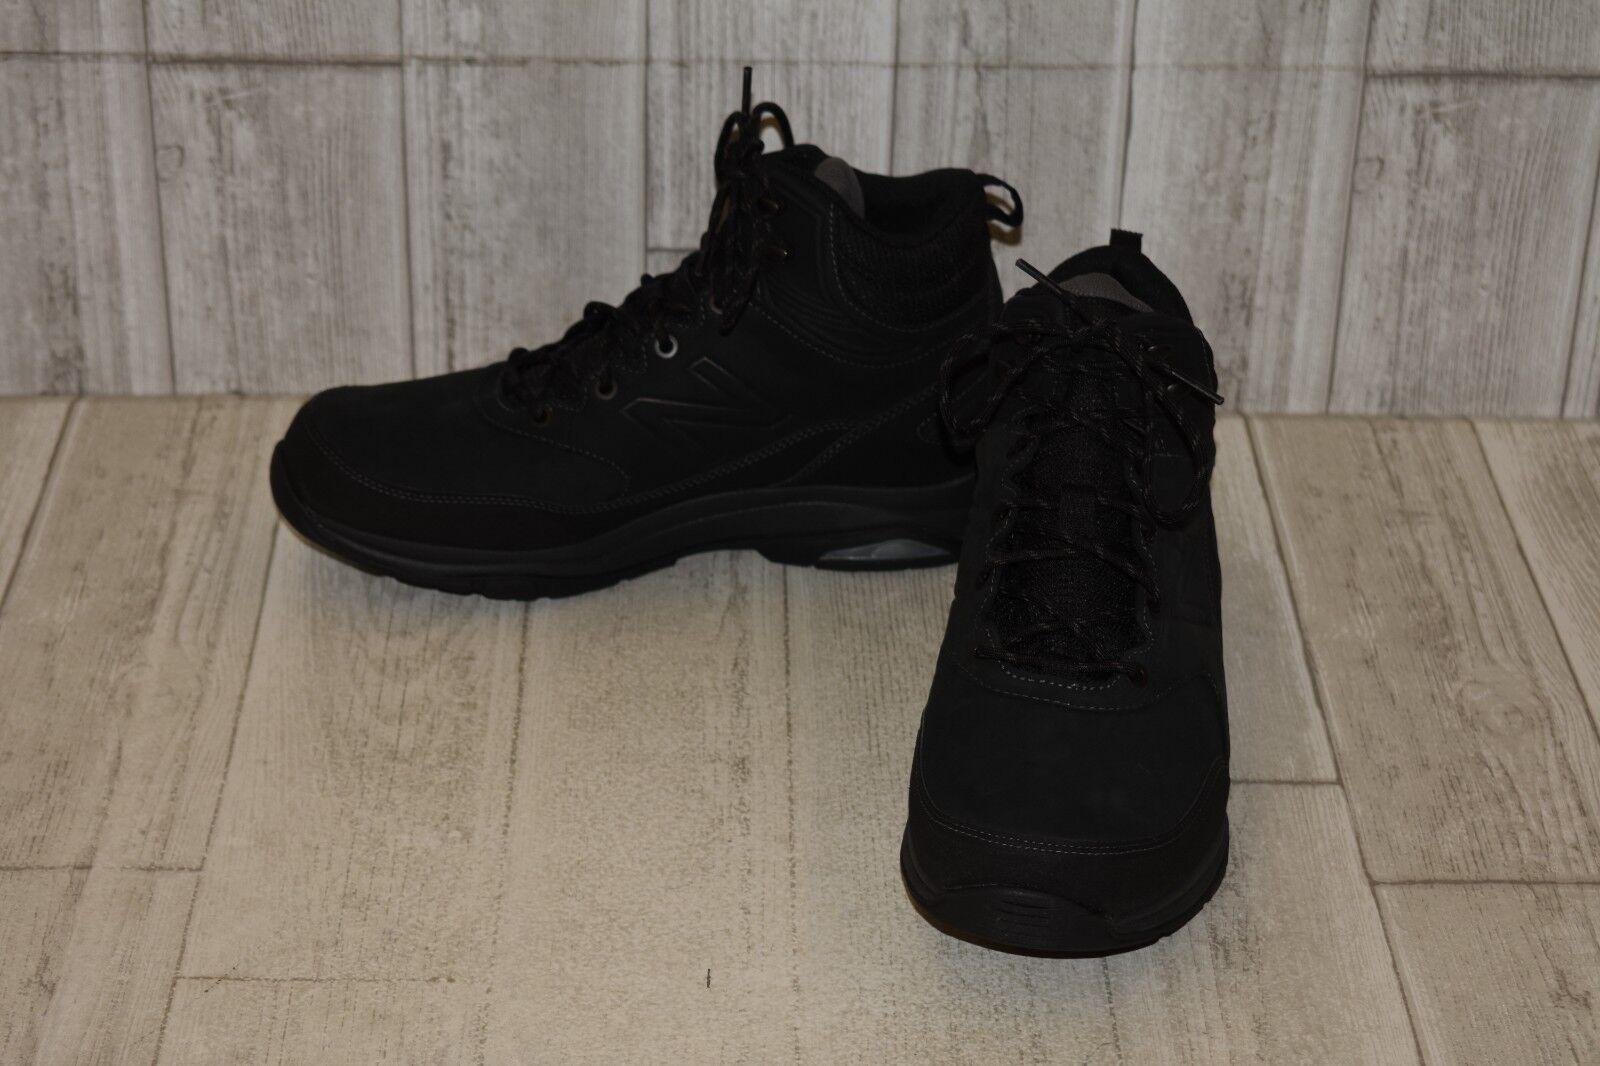 New Balance 1400 Sneaker - Men's Size 11(4E) Black